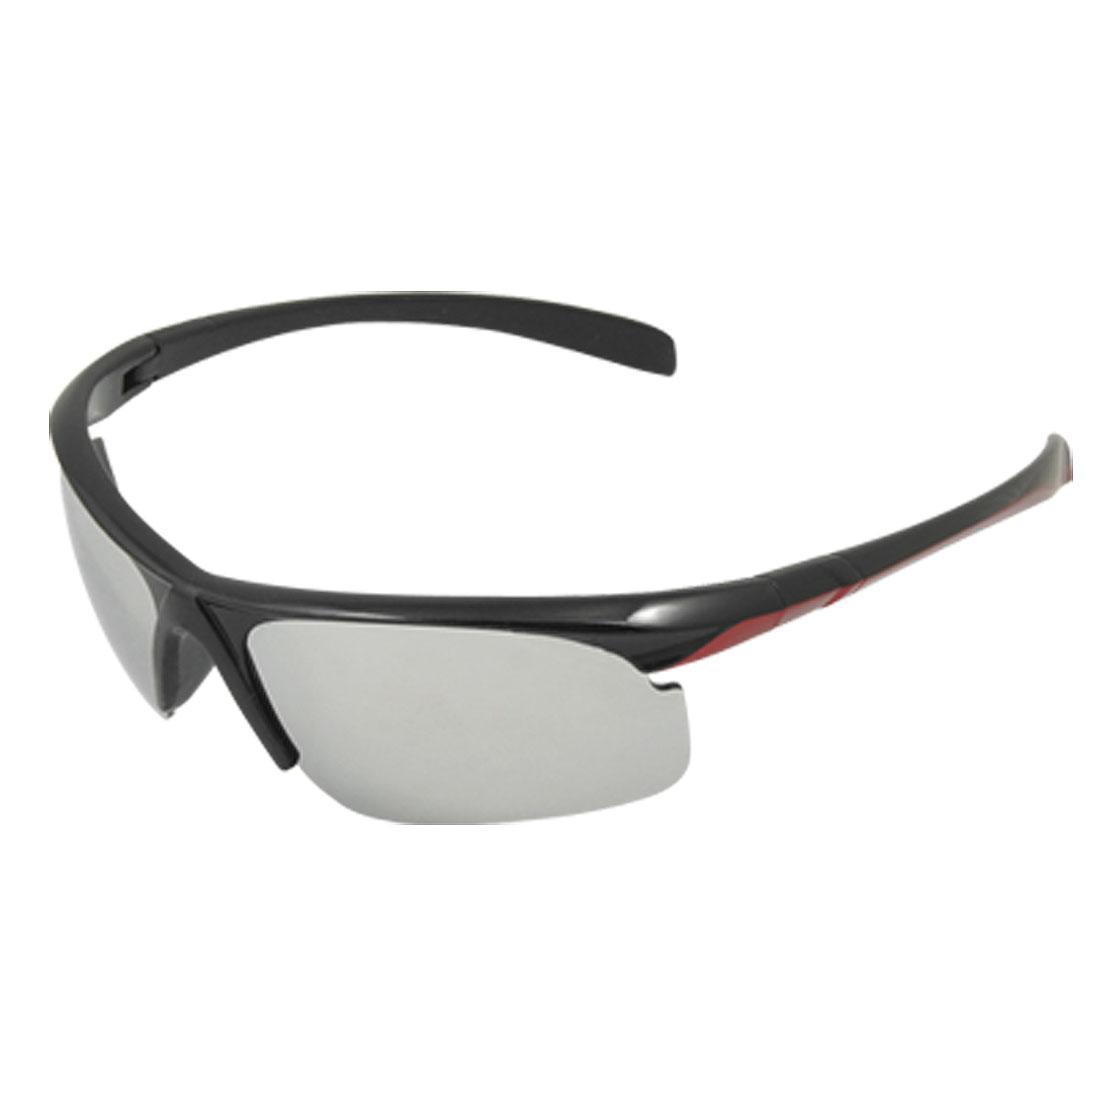 Plastic Semi Rim Sunglasses Black Red for Skiing Beach